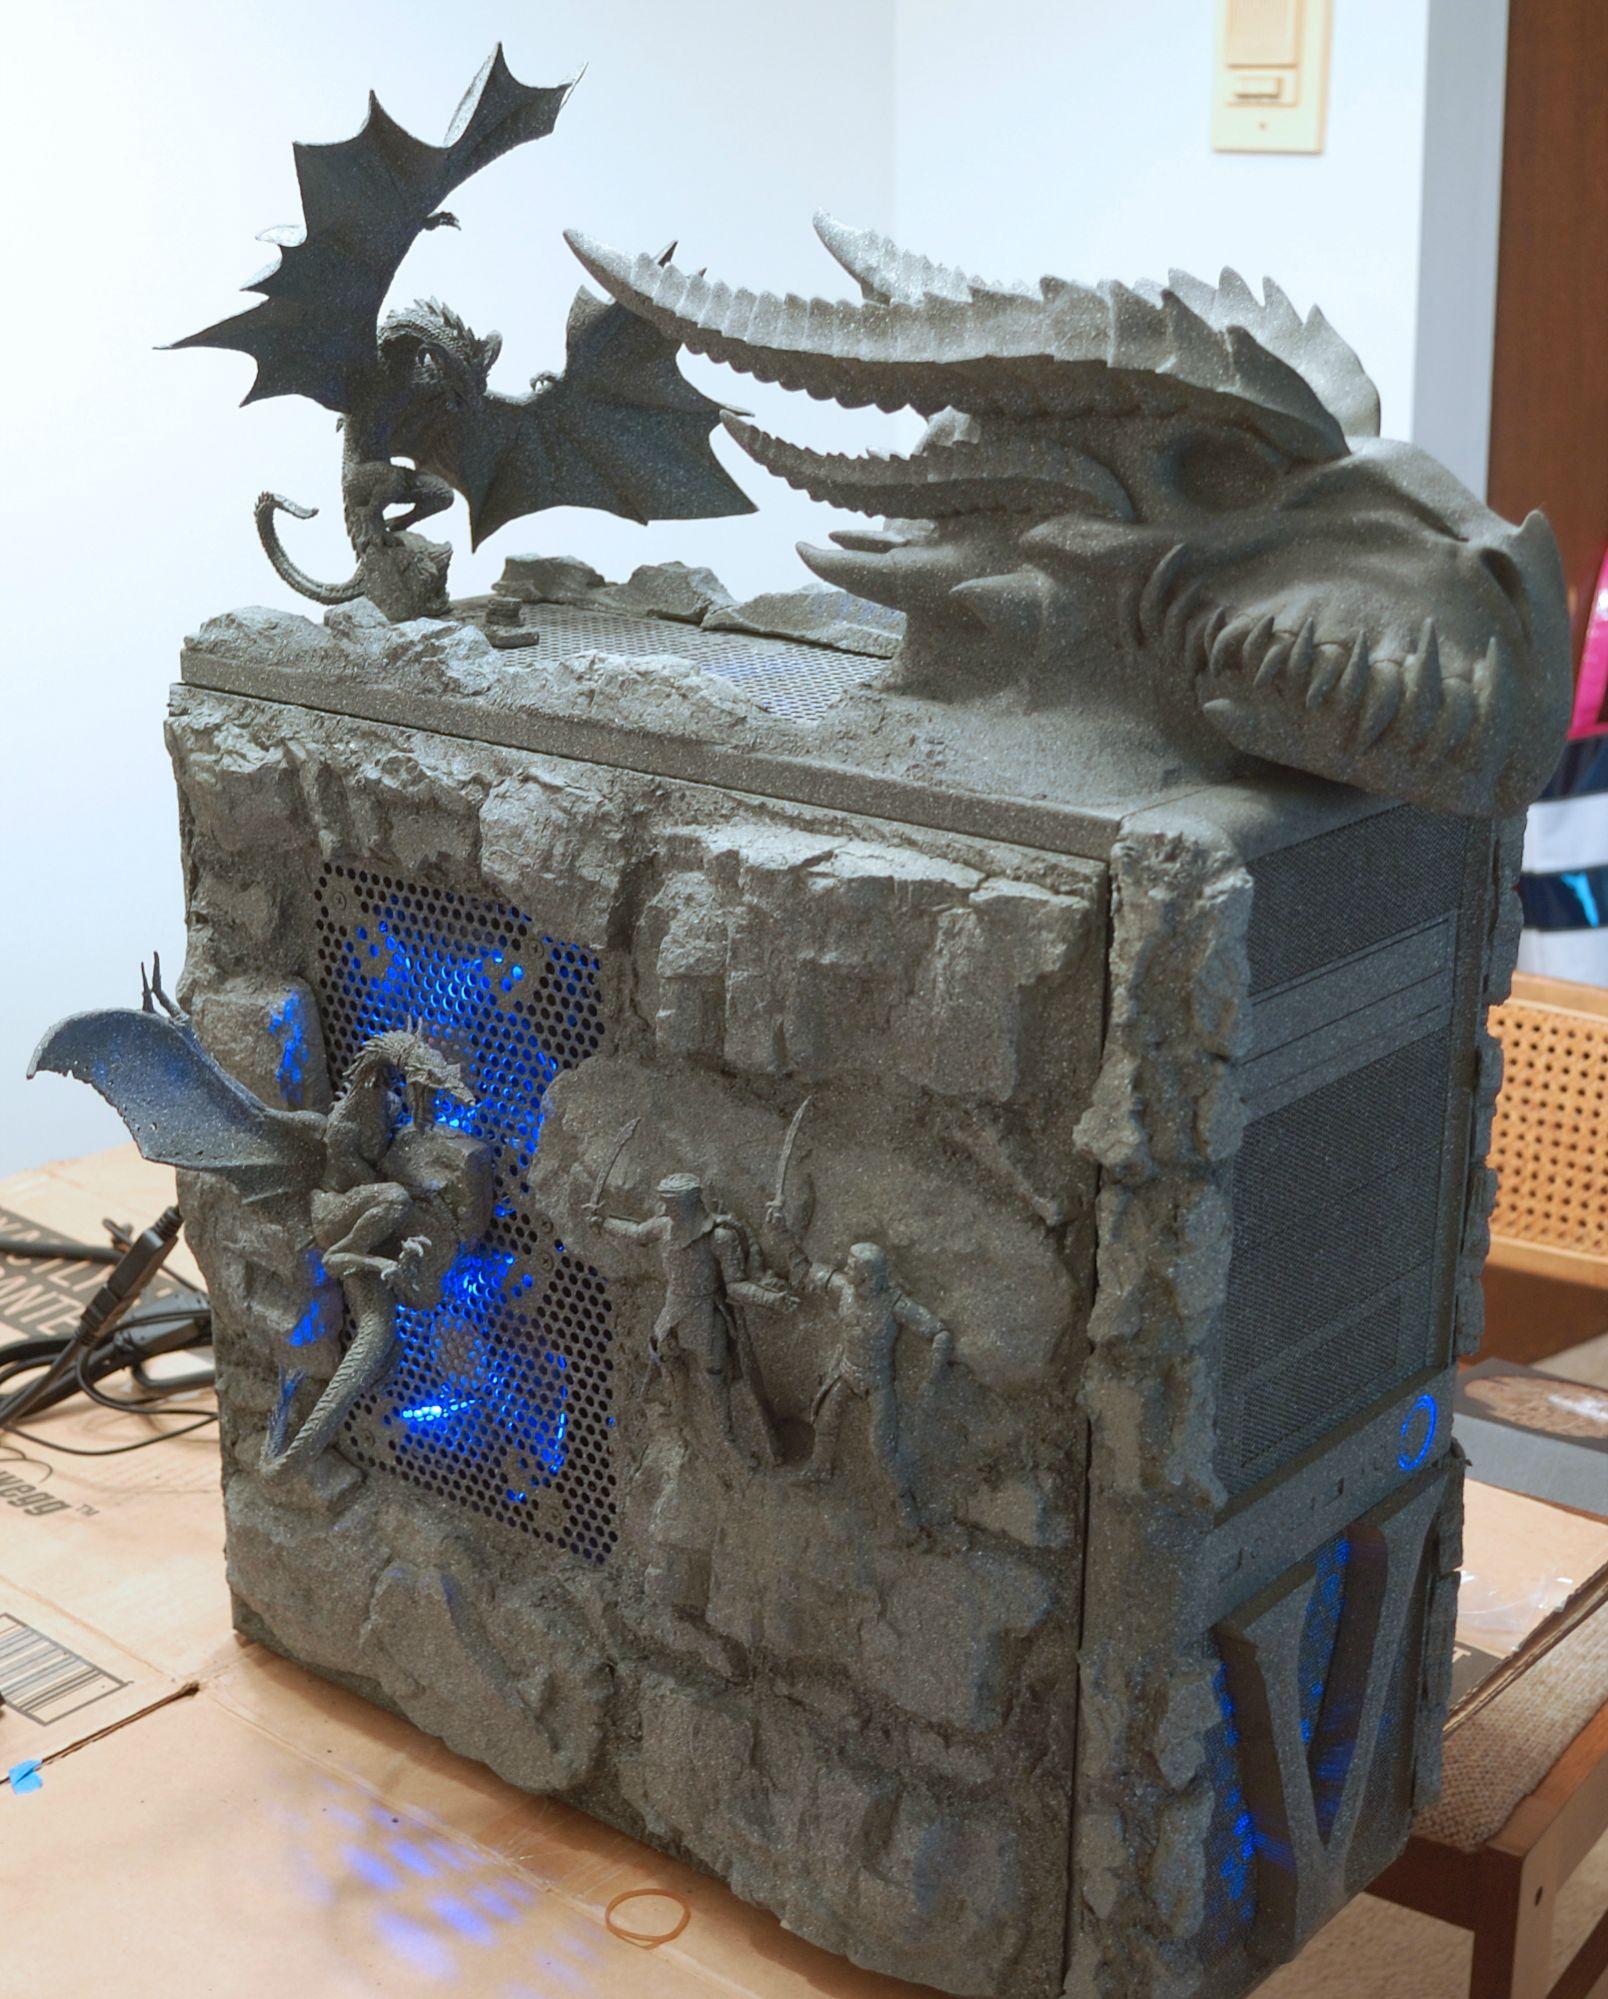 Skyrim Fan Builds Amazing Dovahkiin PC  The Escapist